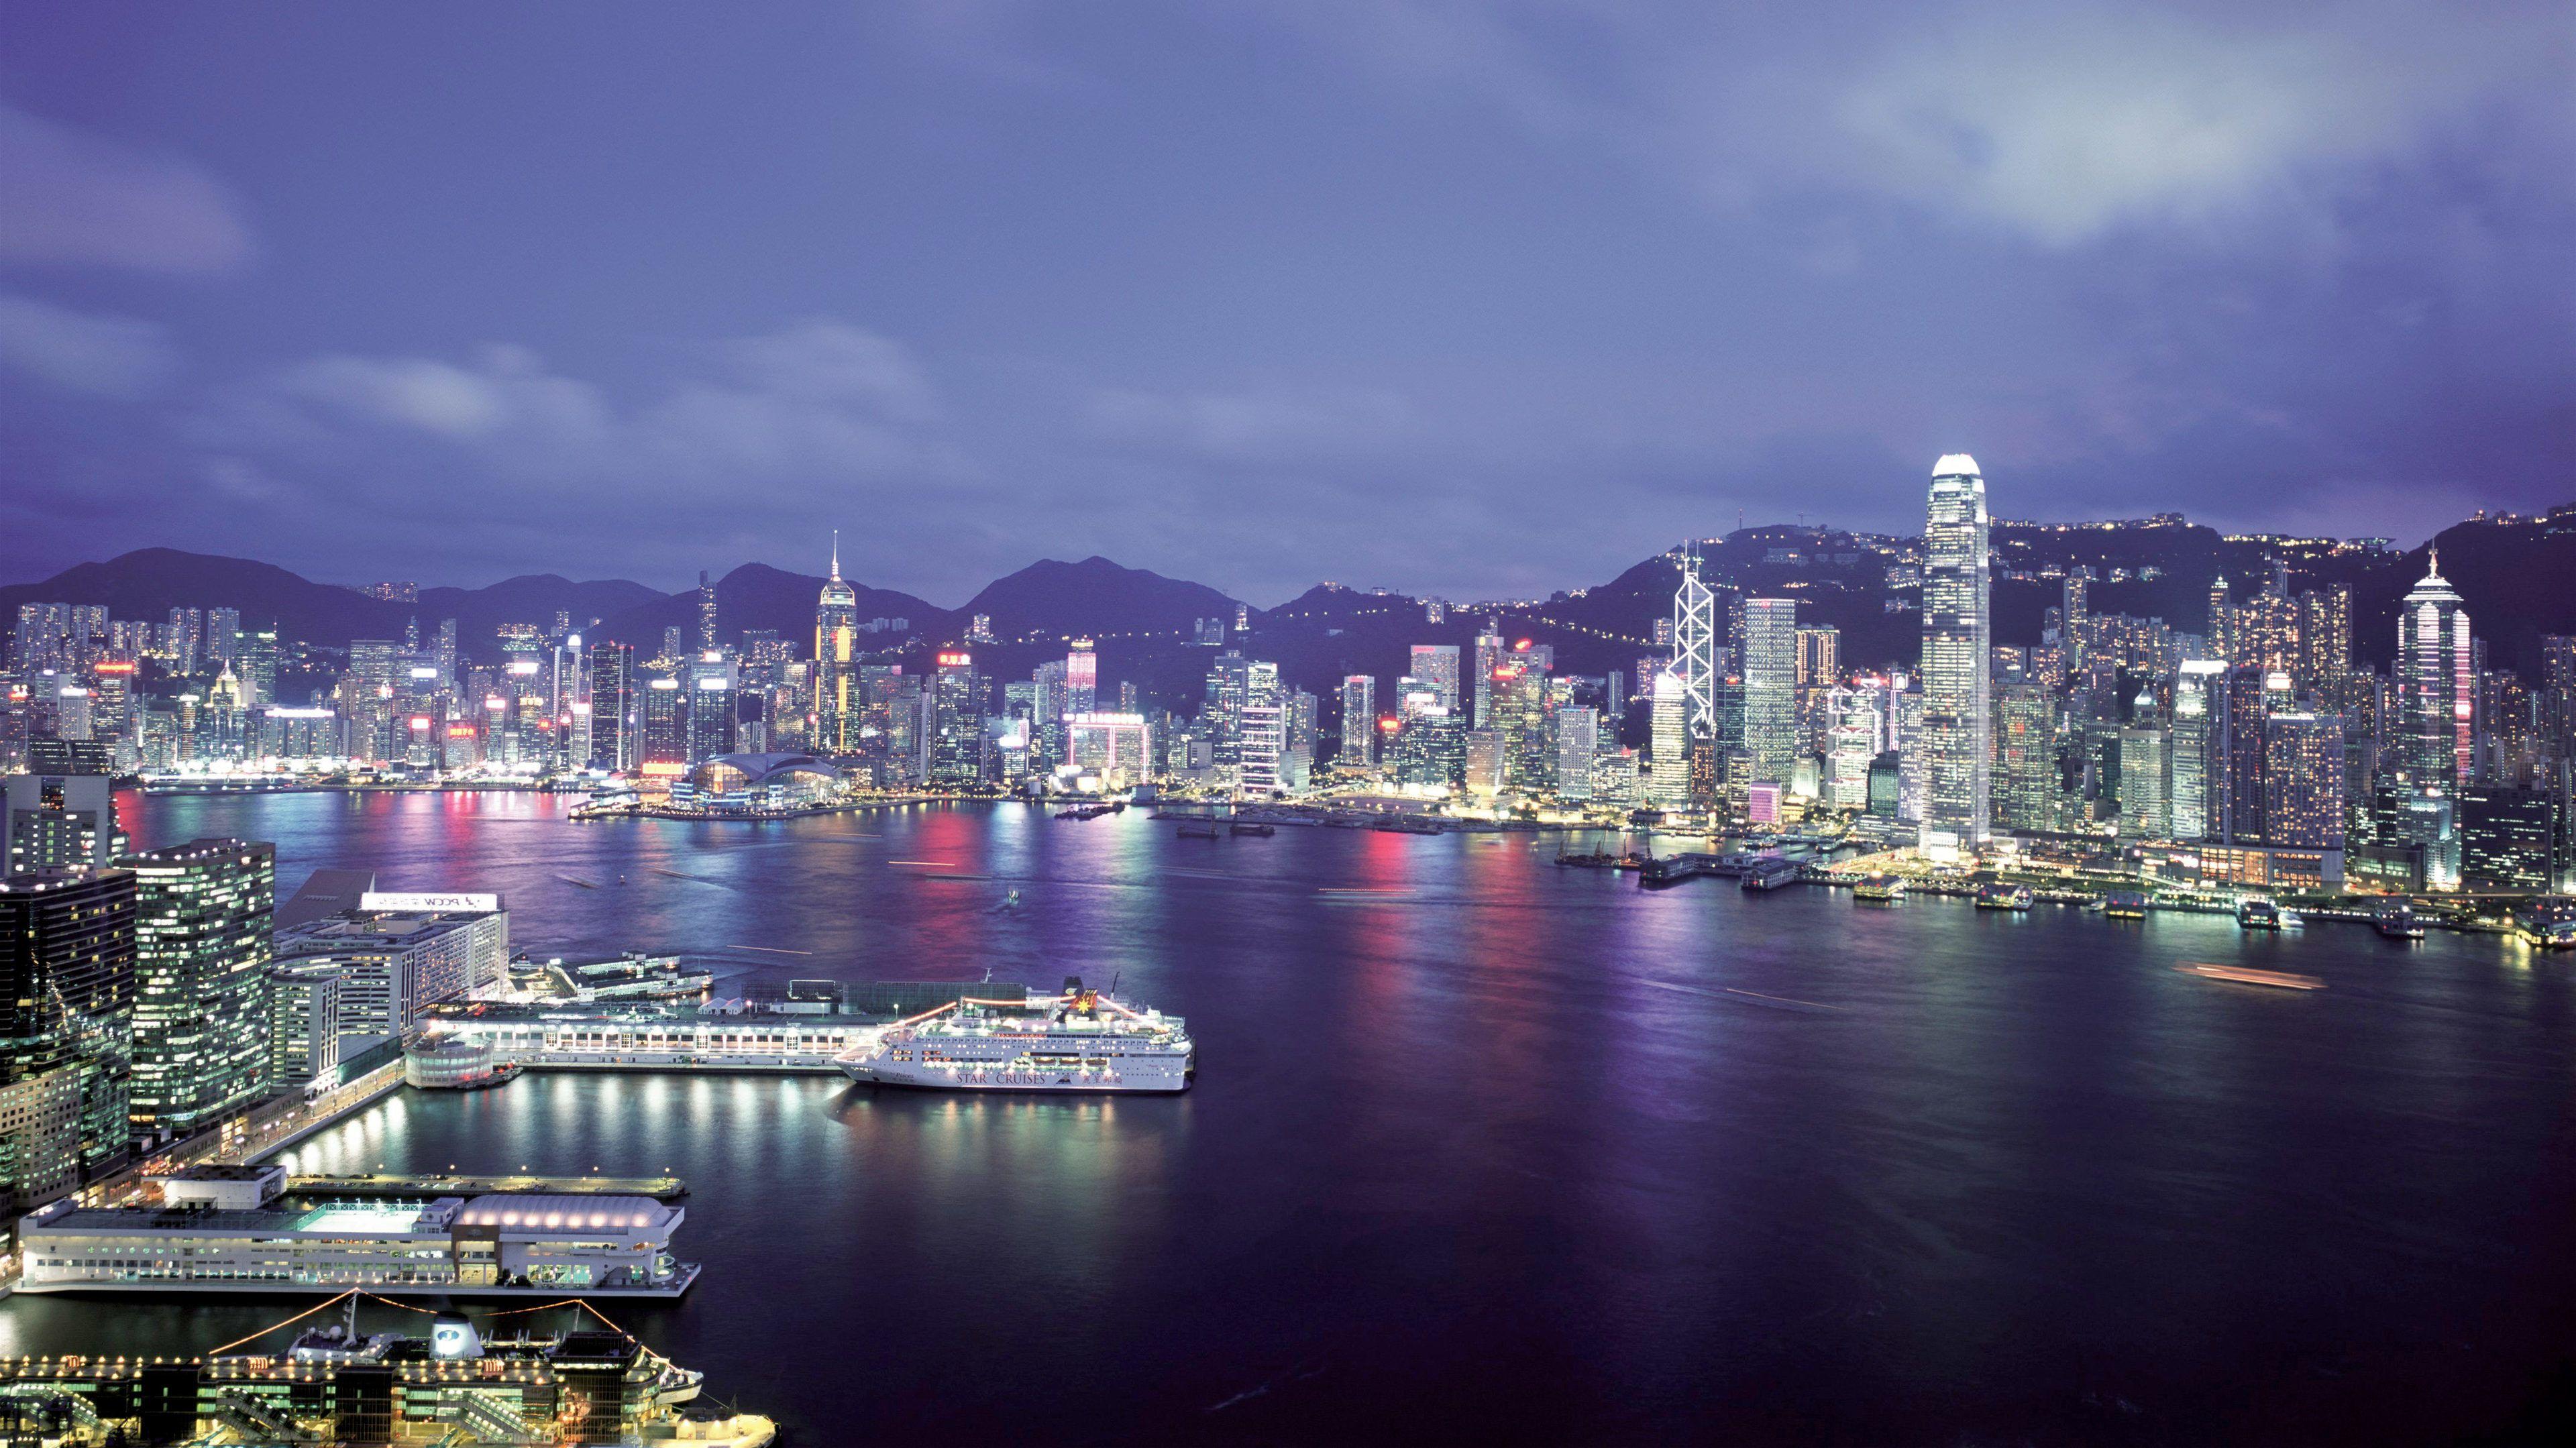 Stunning view of Victoria Peak at night in Hong Kong